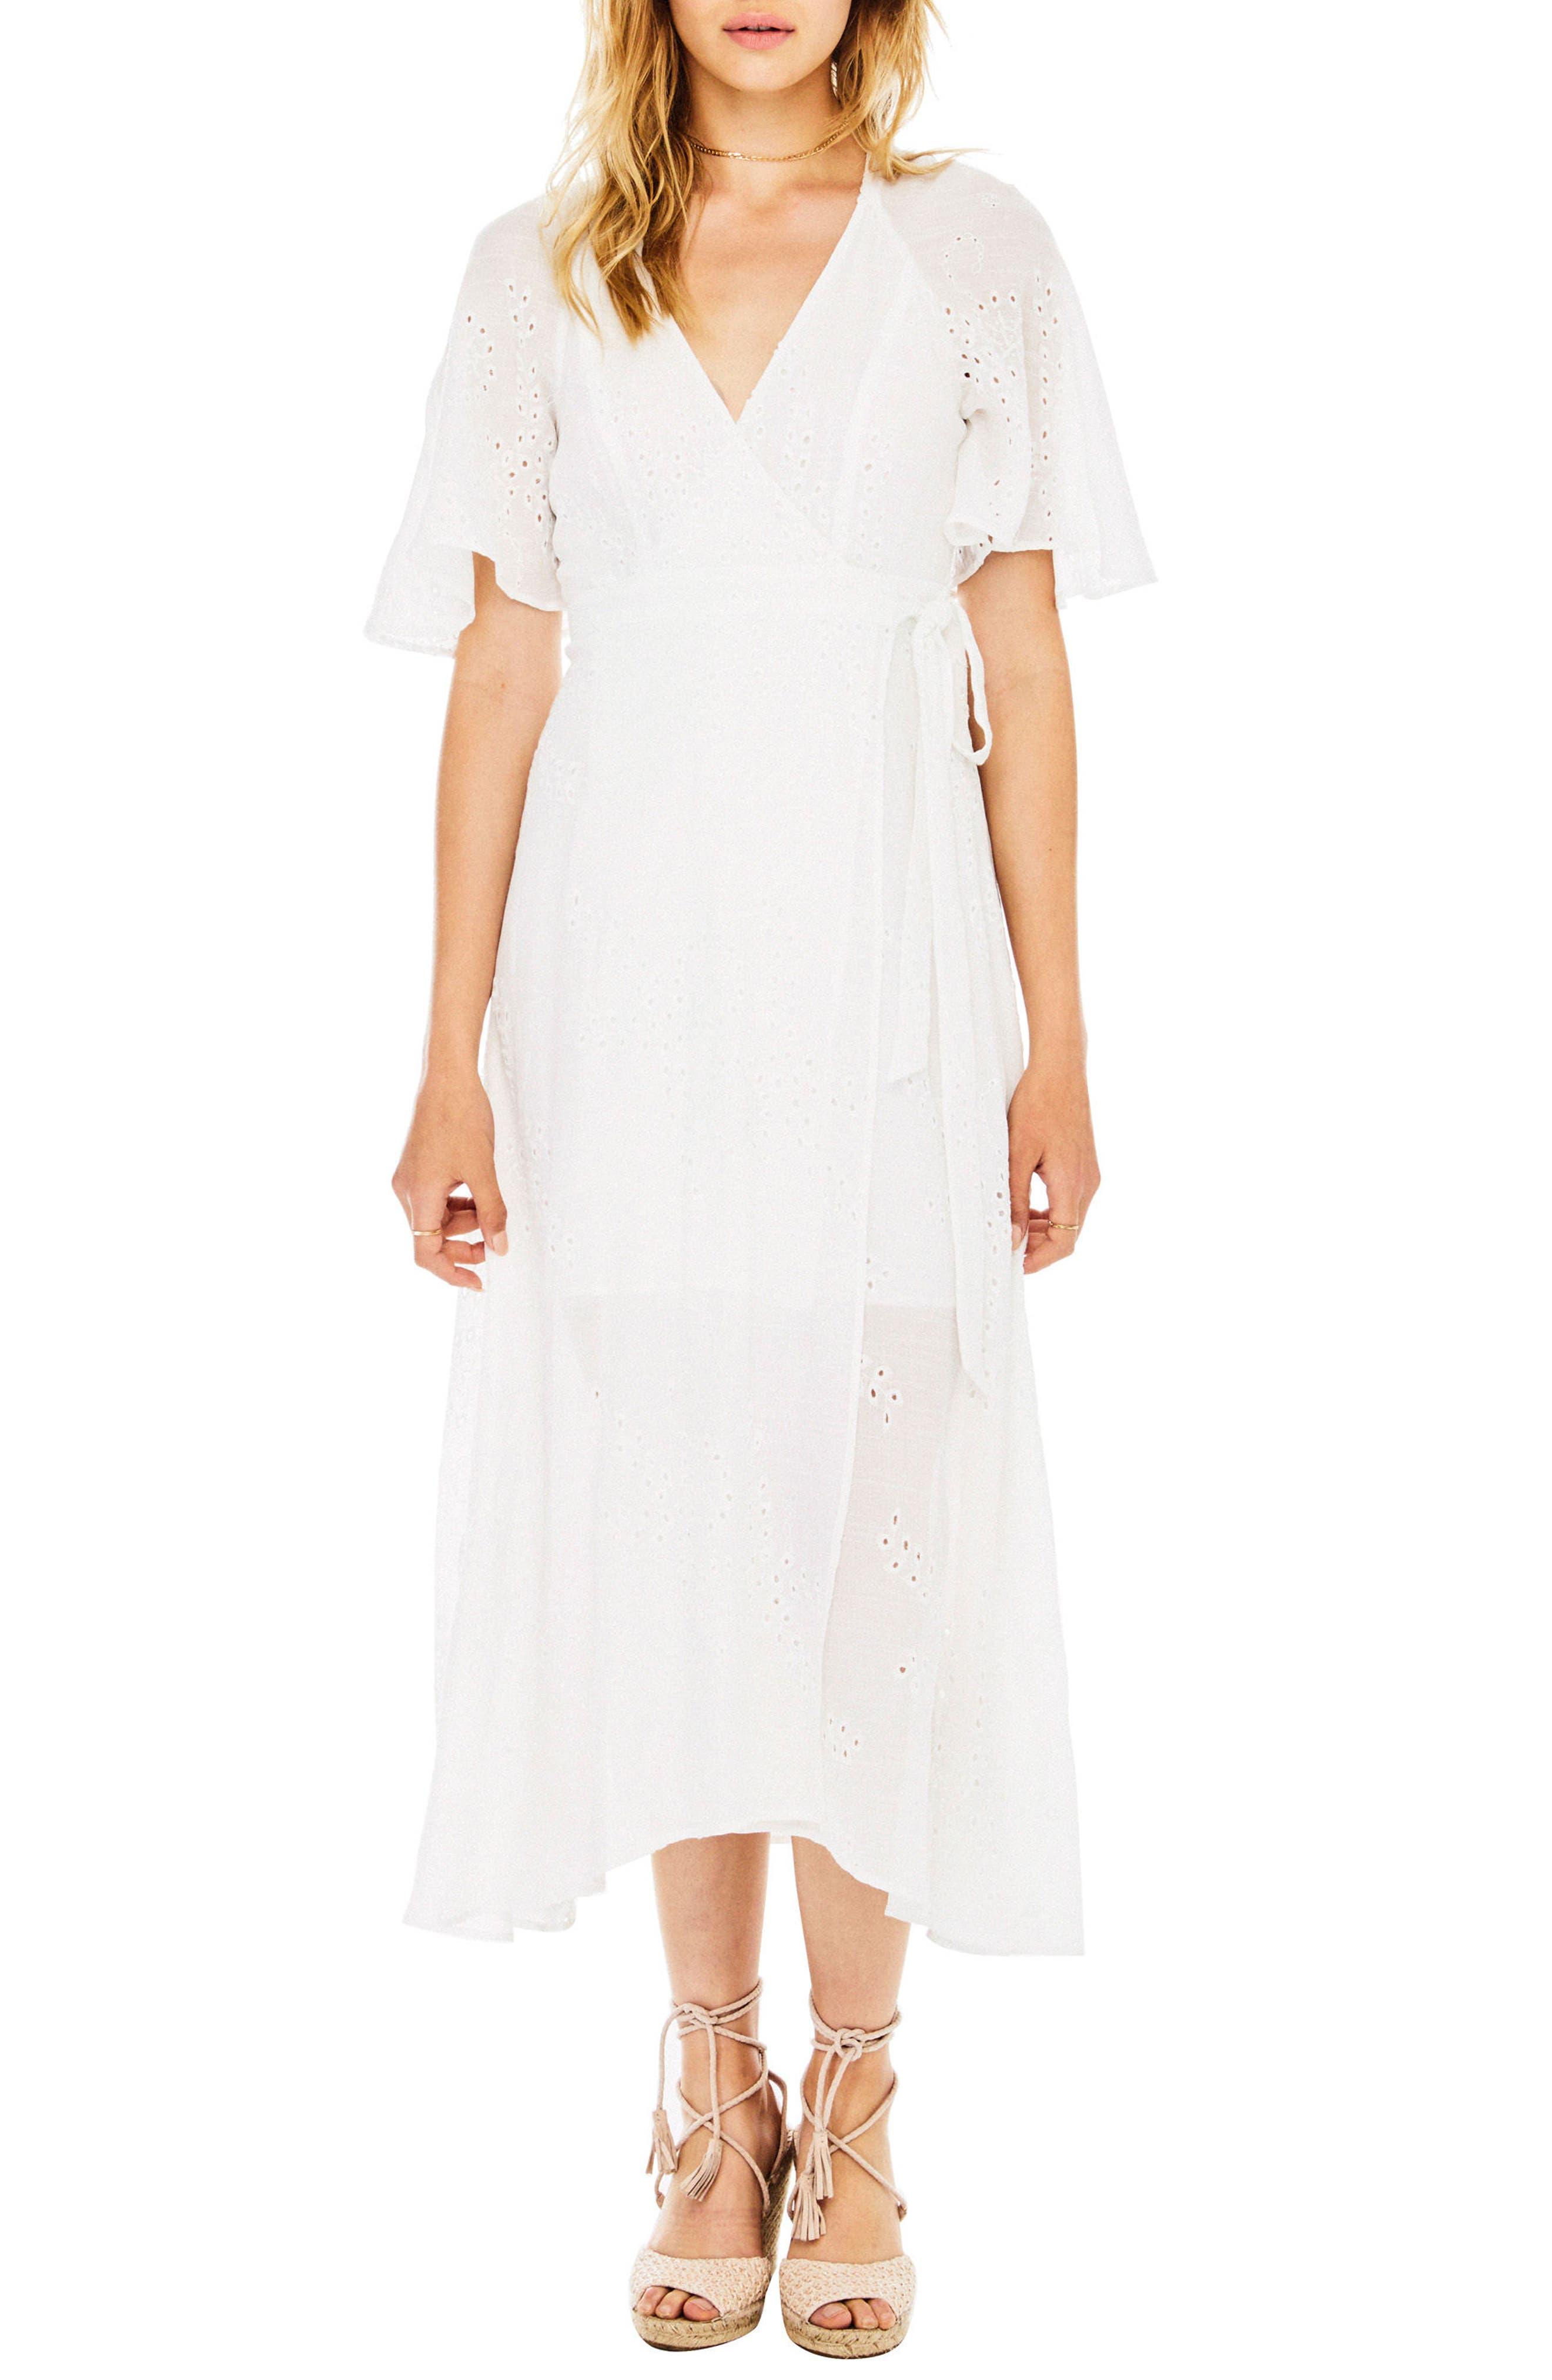 Main Image - ASTR the Label Gretchen Eyelet Wrap Dress